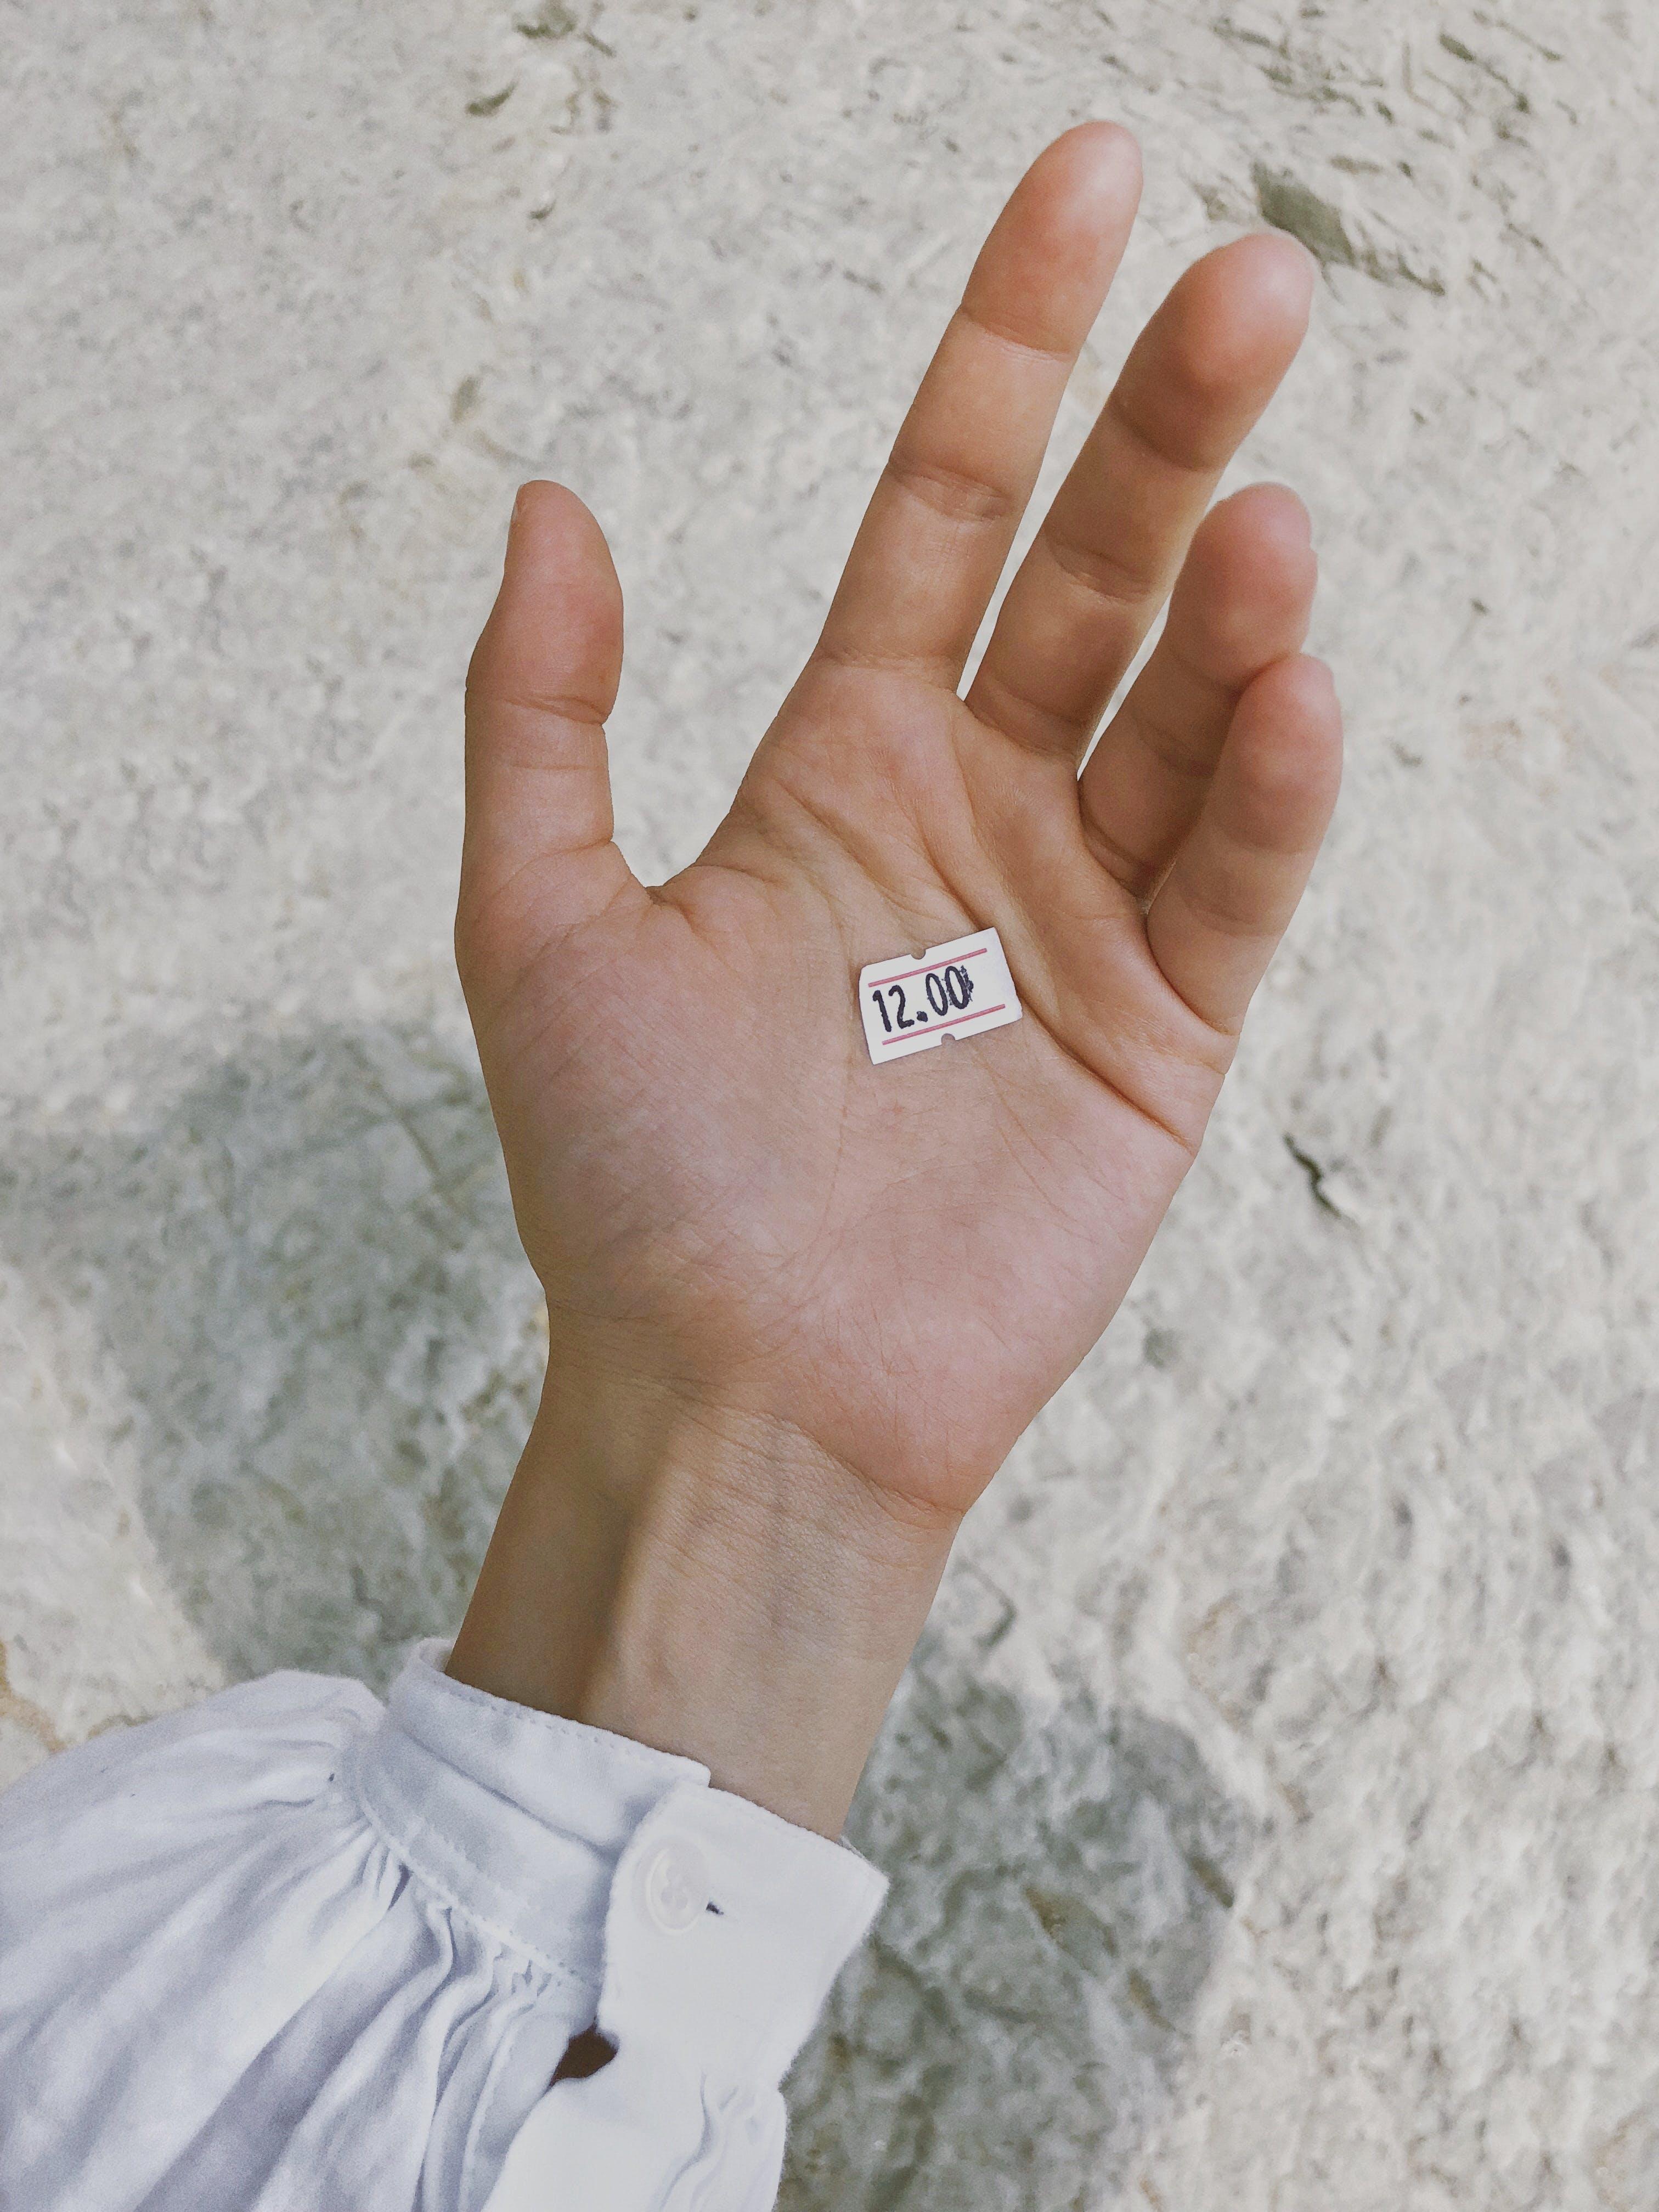 White Price Tag on Human Palm